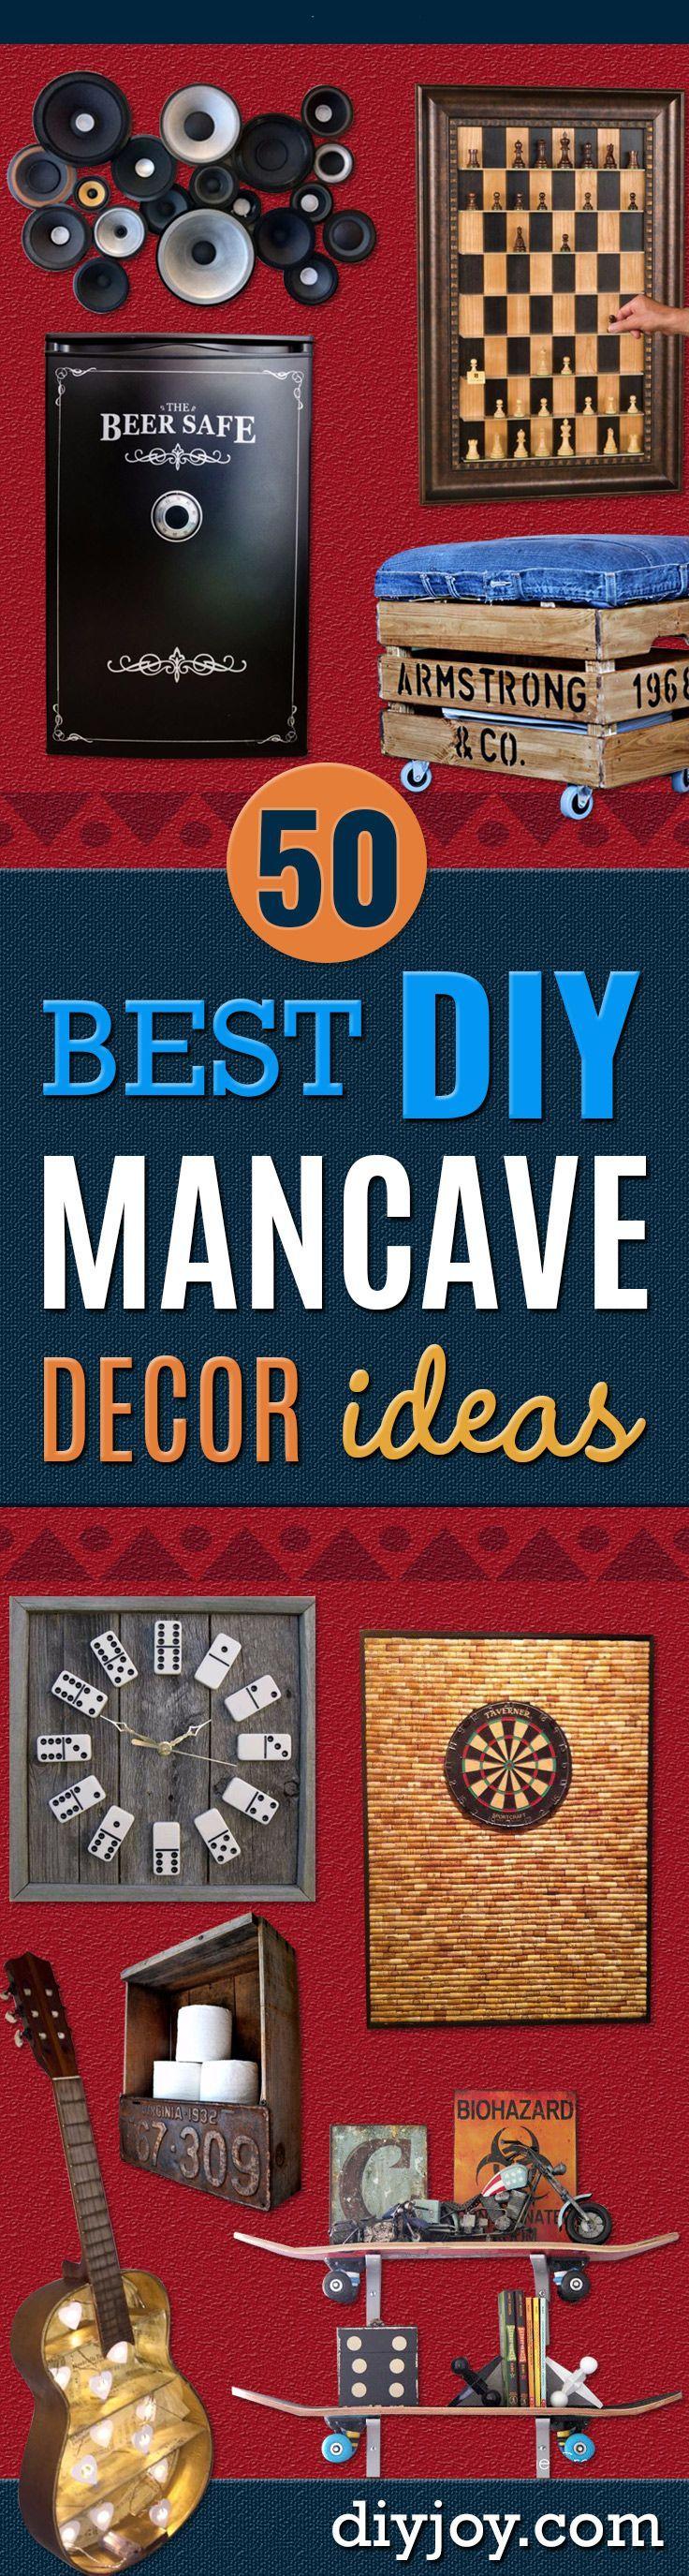 25 best ideas about man cave garage on pinterest. Black Bedroom Furniture Sets. Home Design Ideas